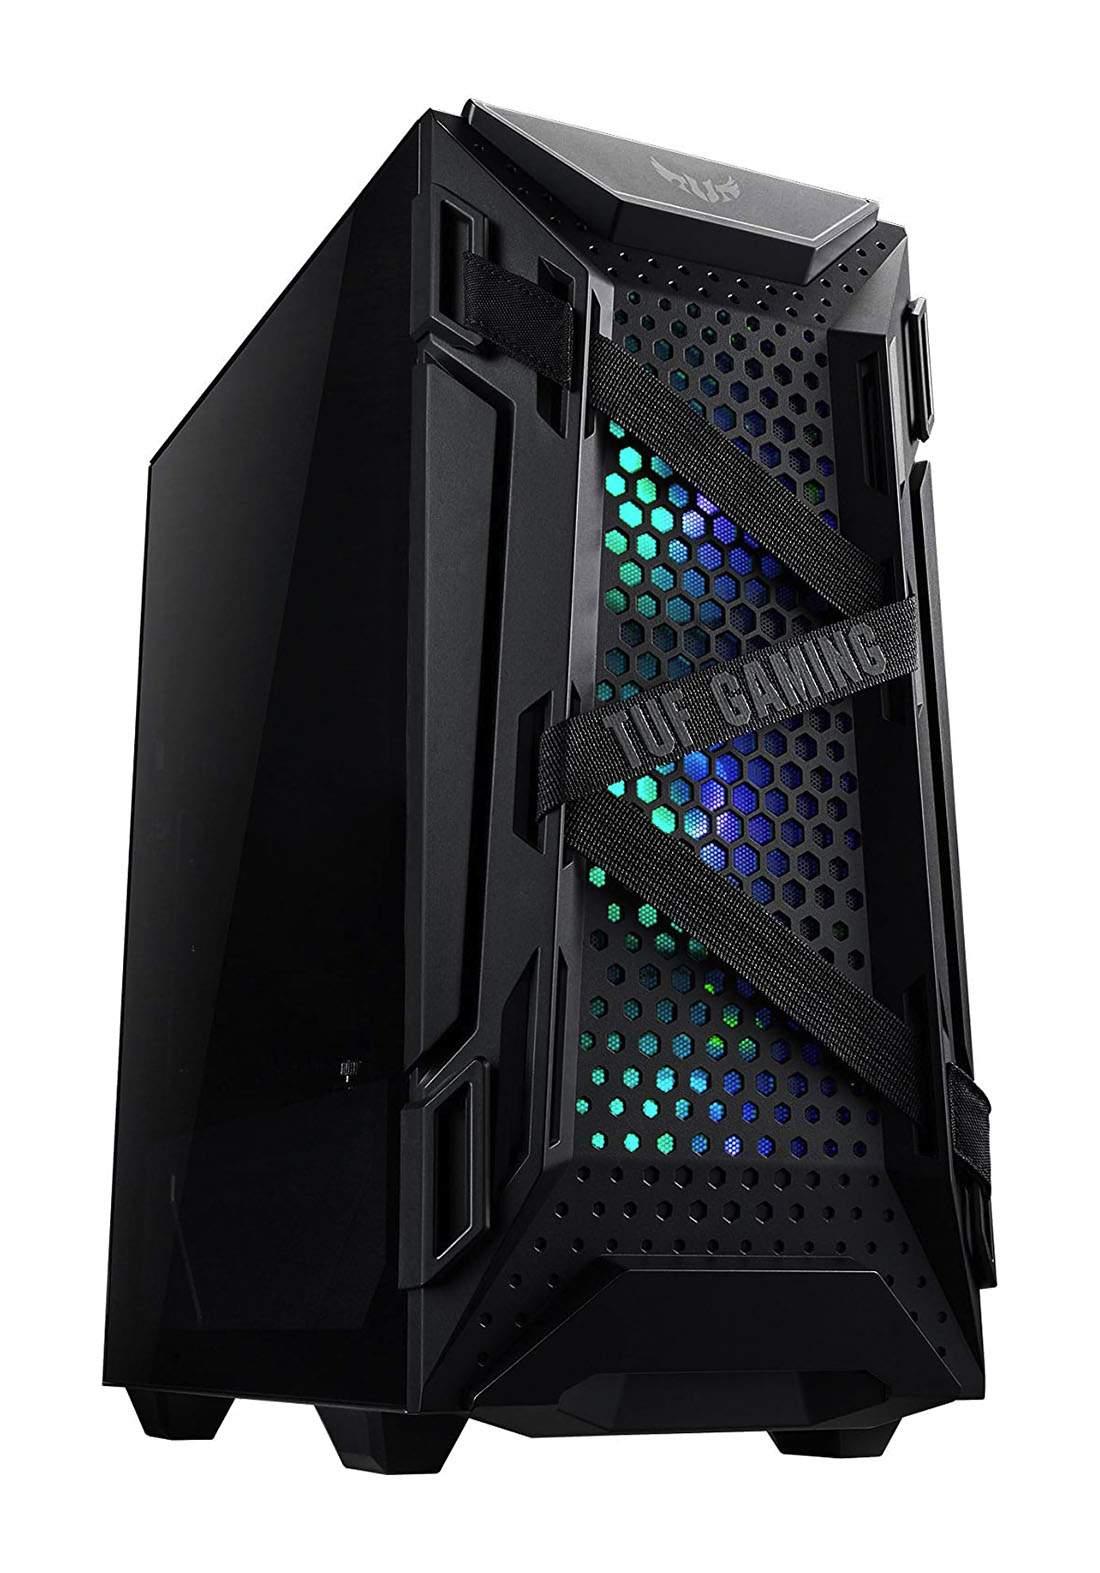 Asus Tuf Gaming GT301 Rgb Tempered Glass - Black  كيس حاسبة